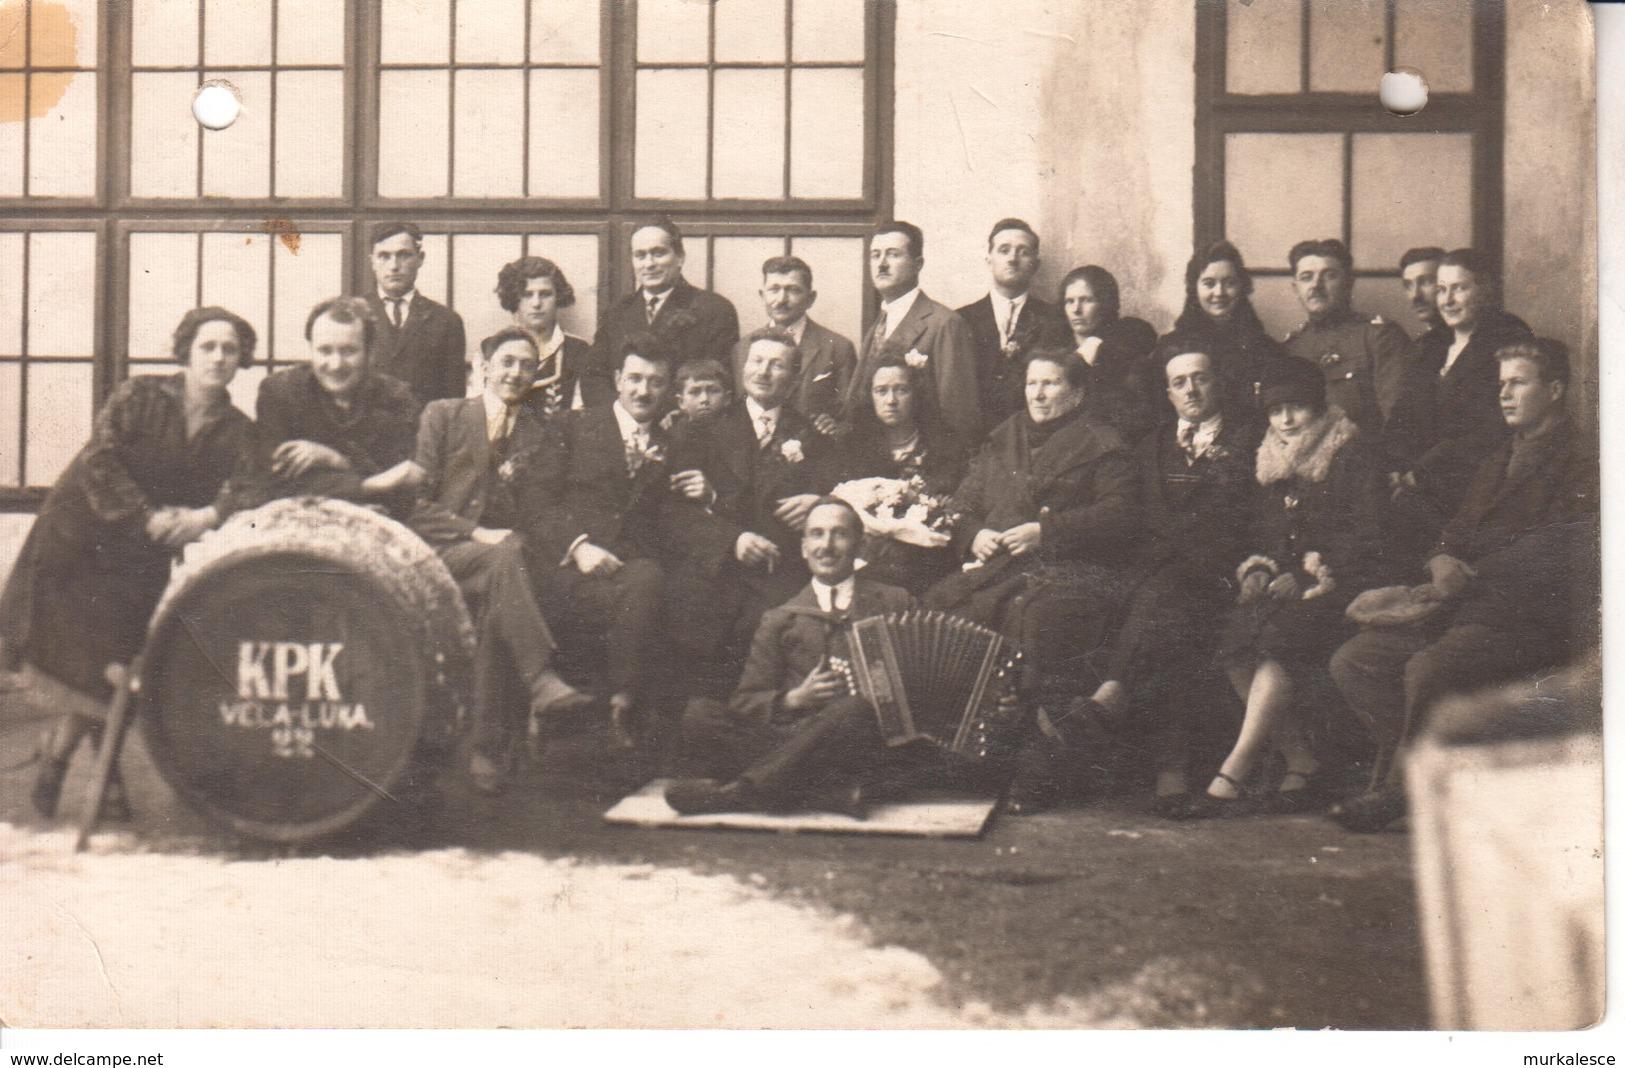 4964   Ak-- KORCULANSKI  PLIVACKI  KLUB  VELA LUKA - Croazia